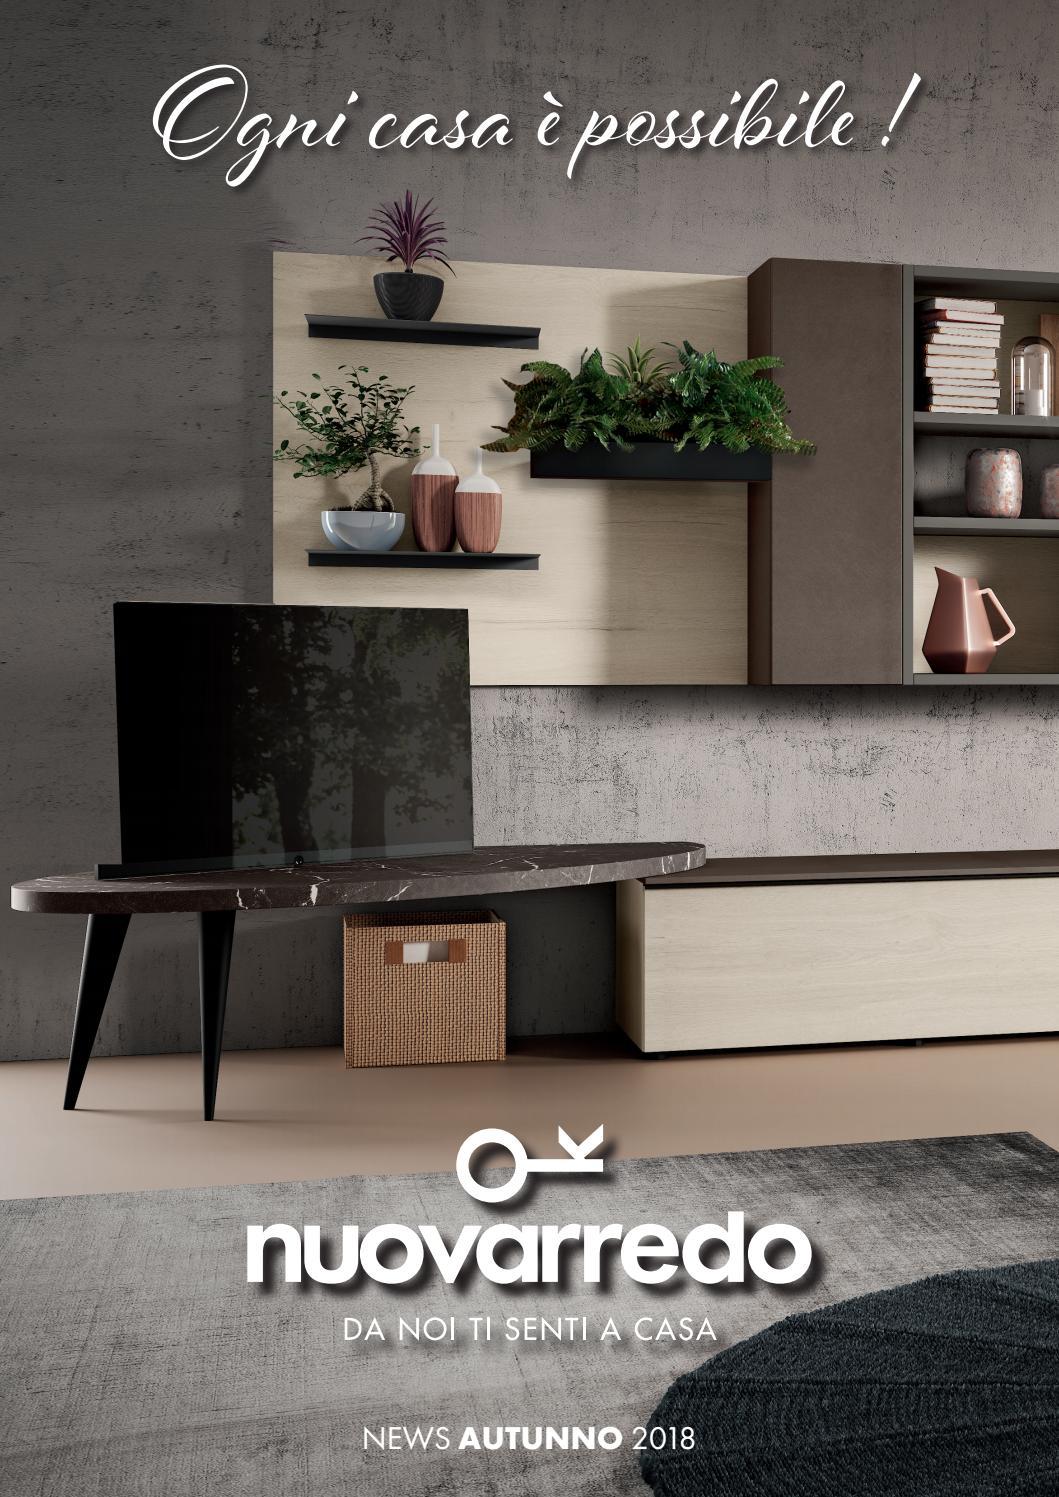 Nuovo Arredo A Taranto.News Autunno 2018 By Nuovarredo Issuu